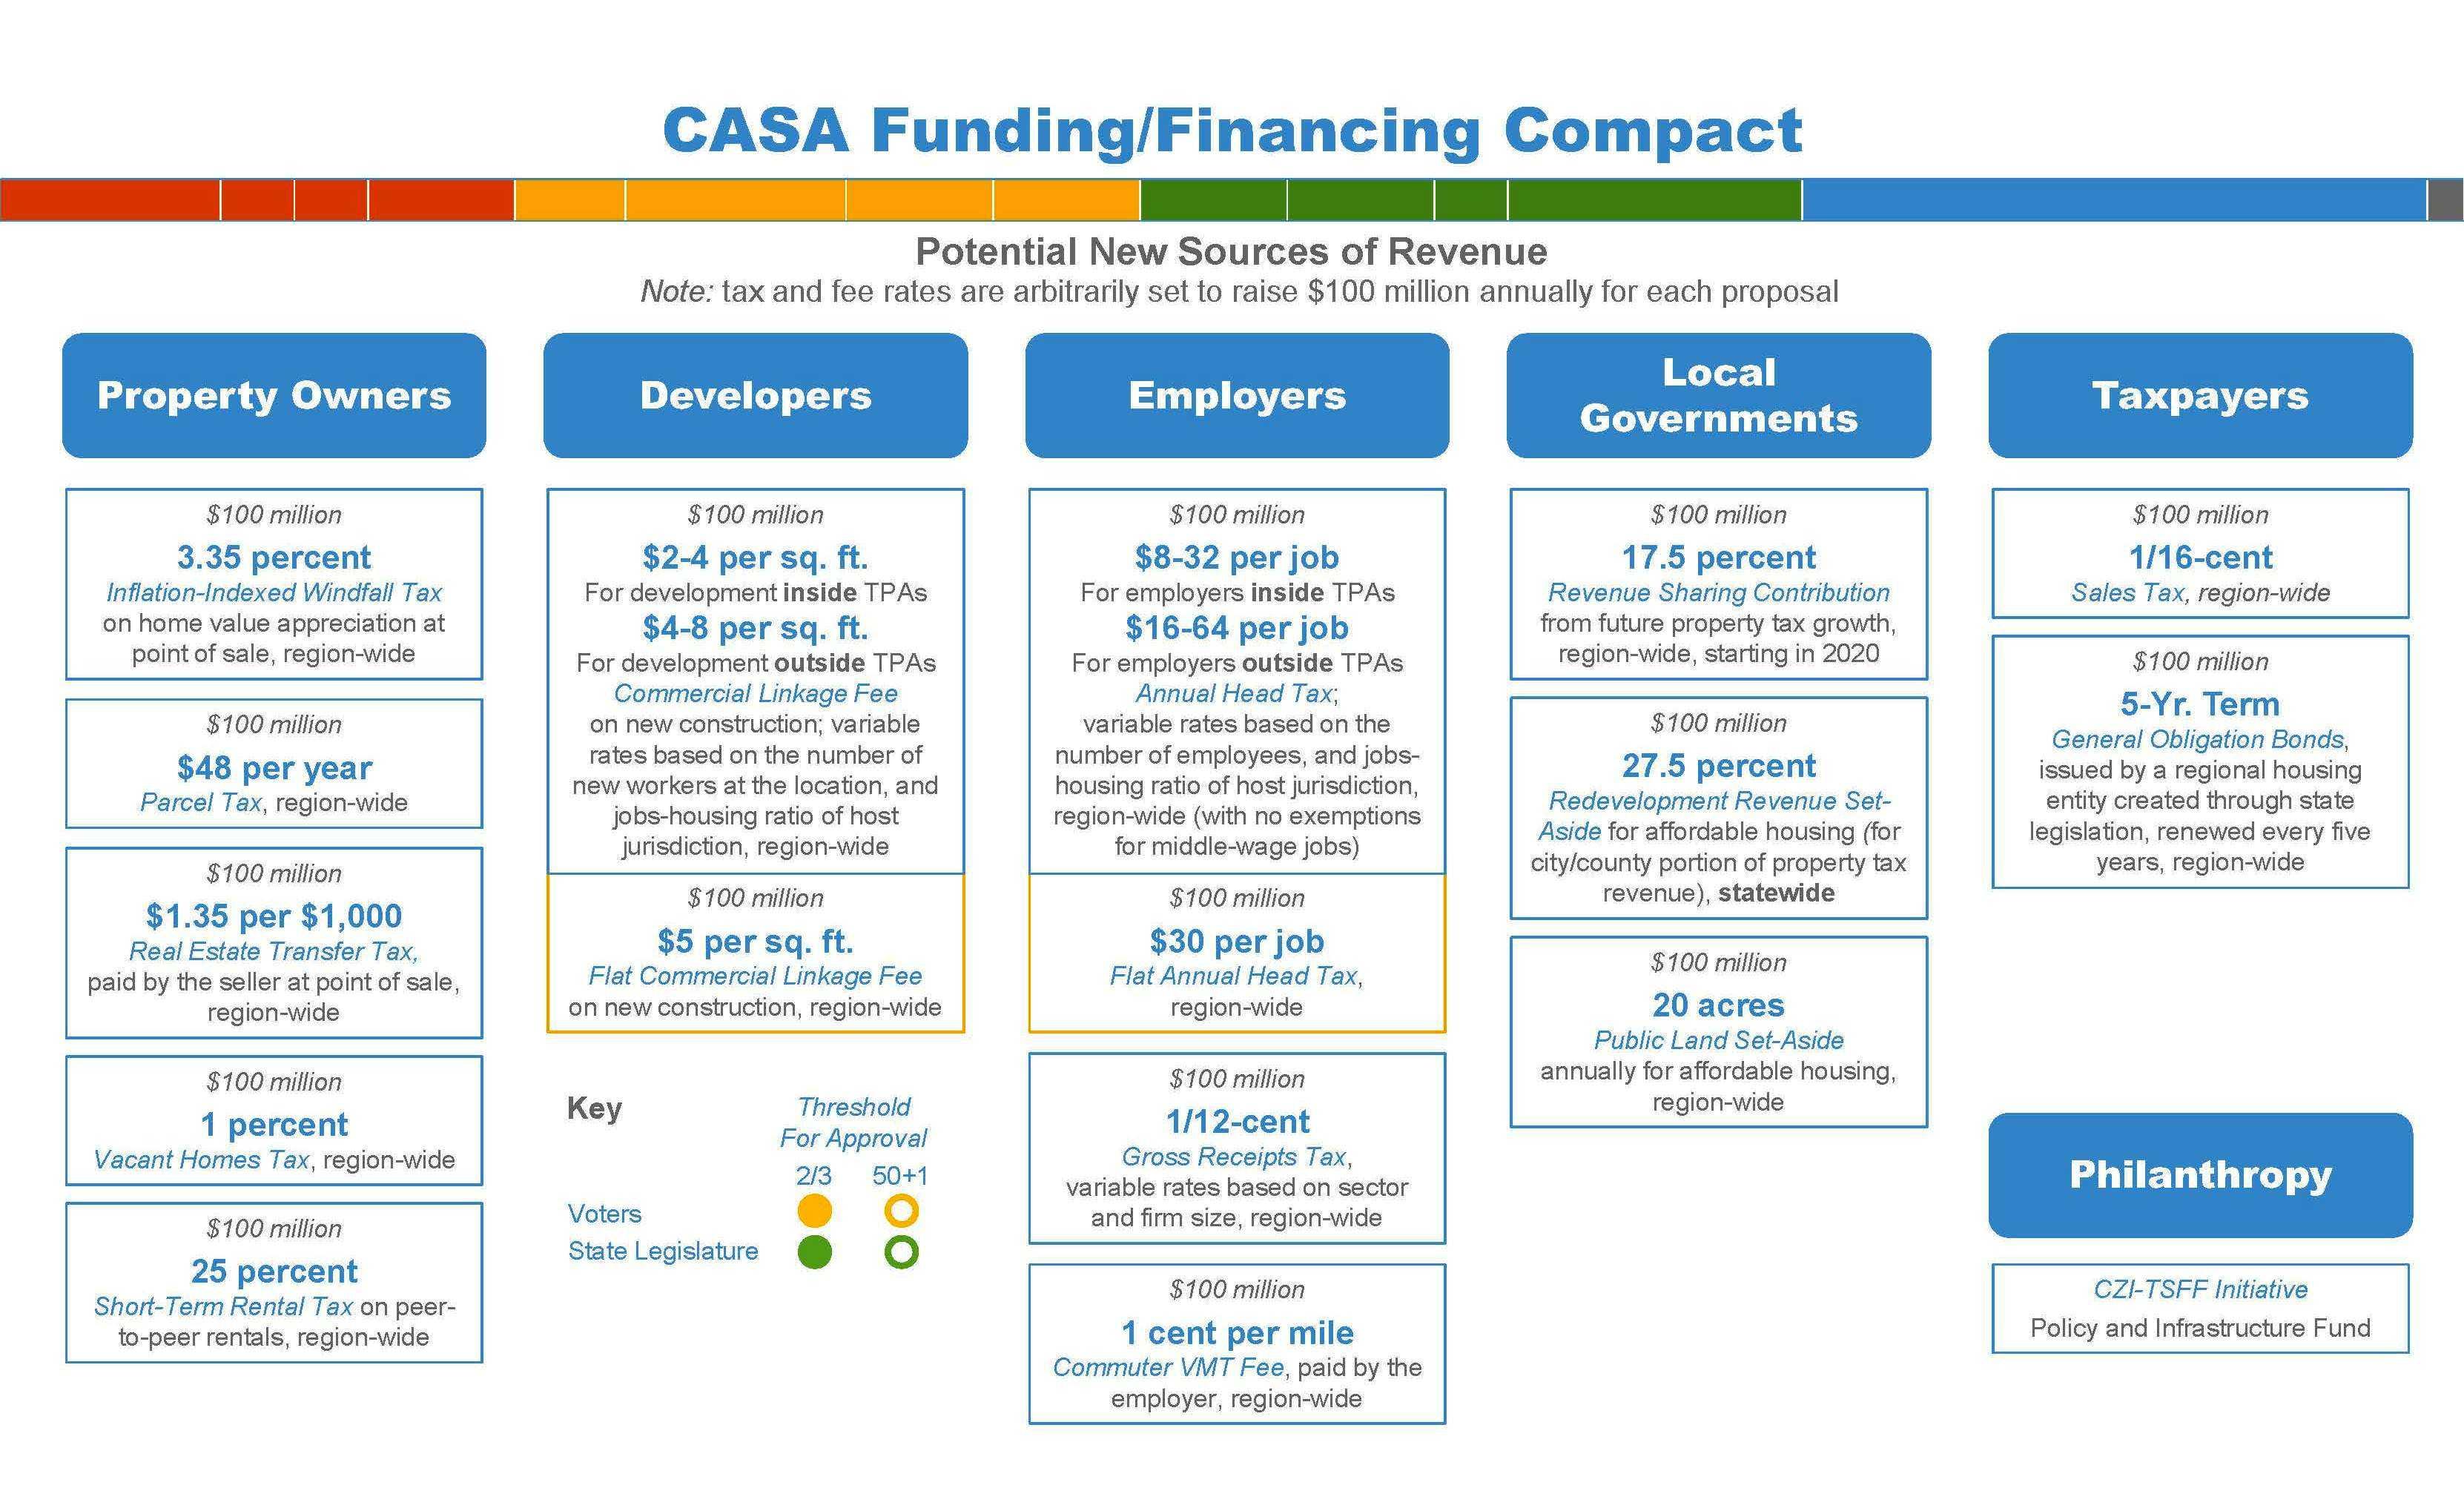 CASA Funding Chart